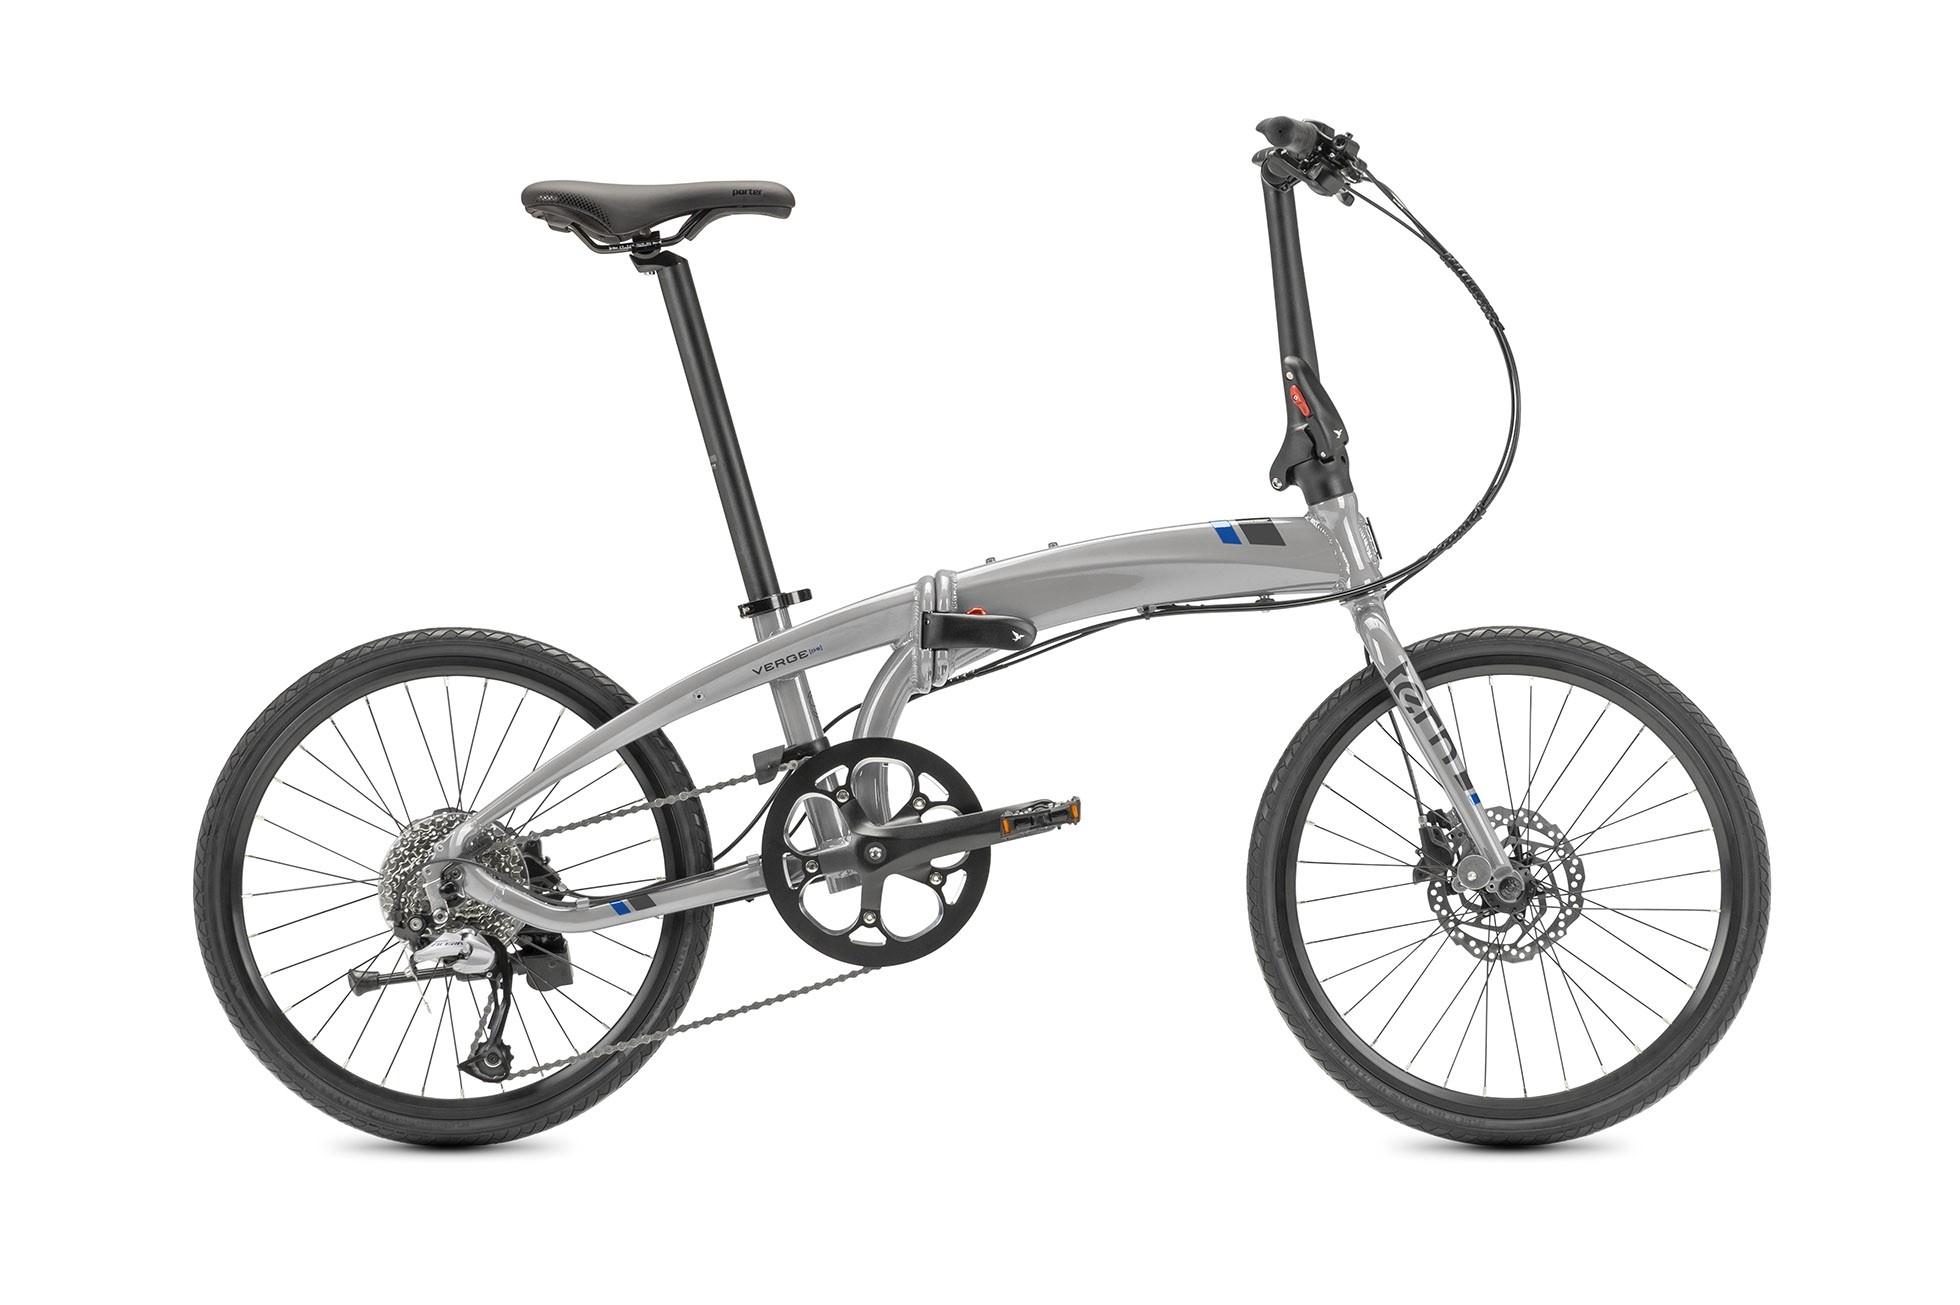 TERN Verge D9 Silver - Disponible fin octobre 2020